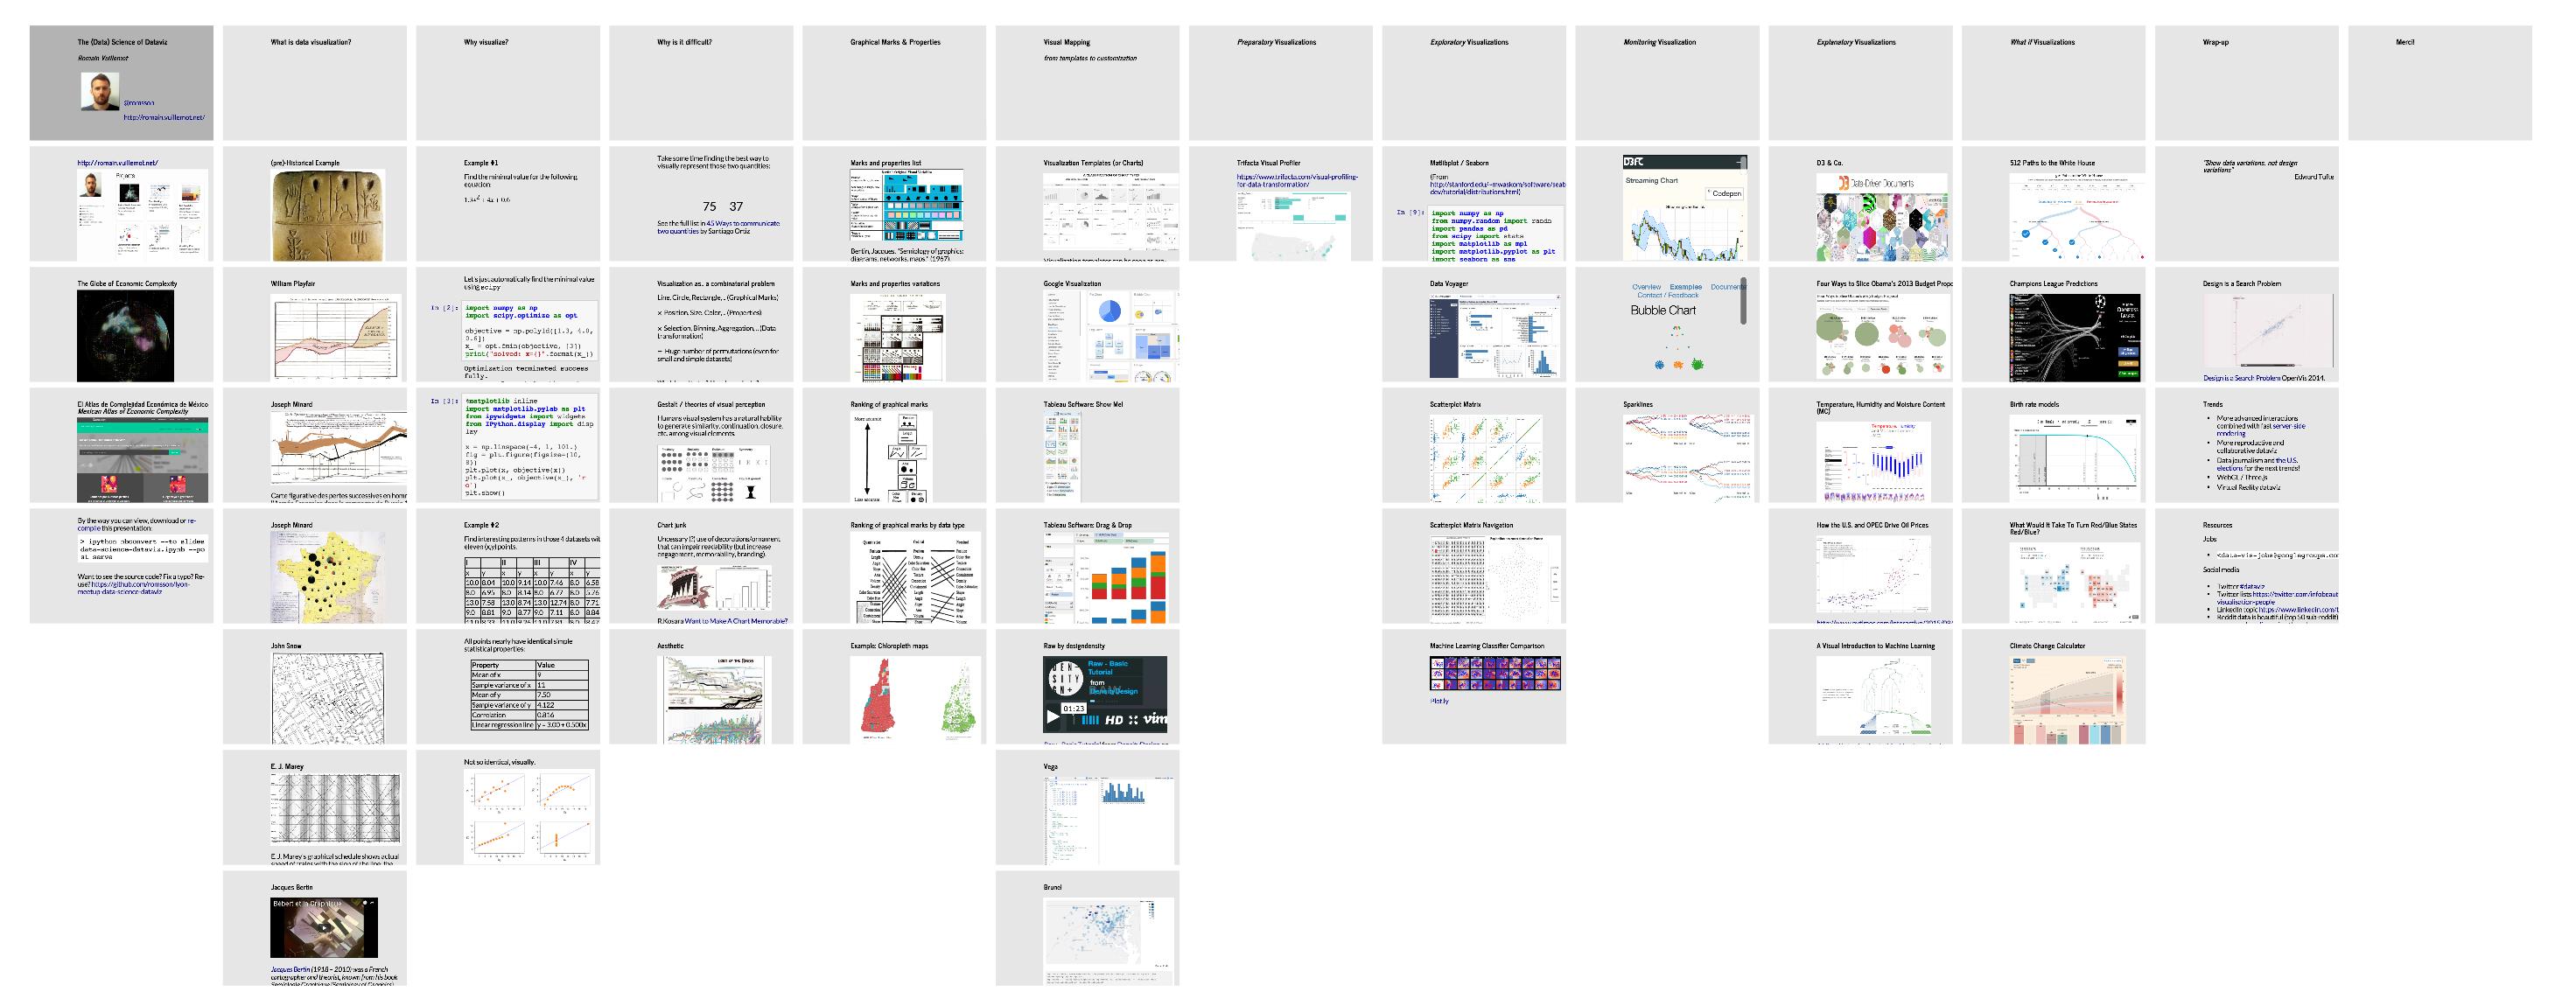 The Data Science of Dataviz feature image